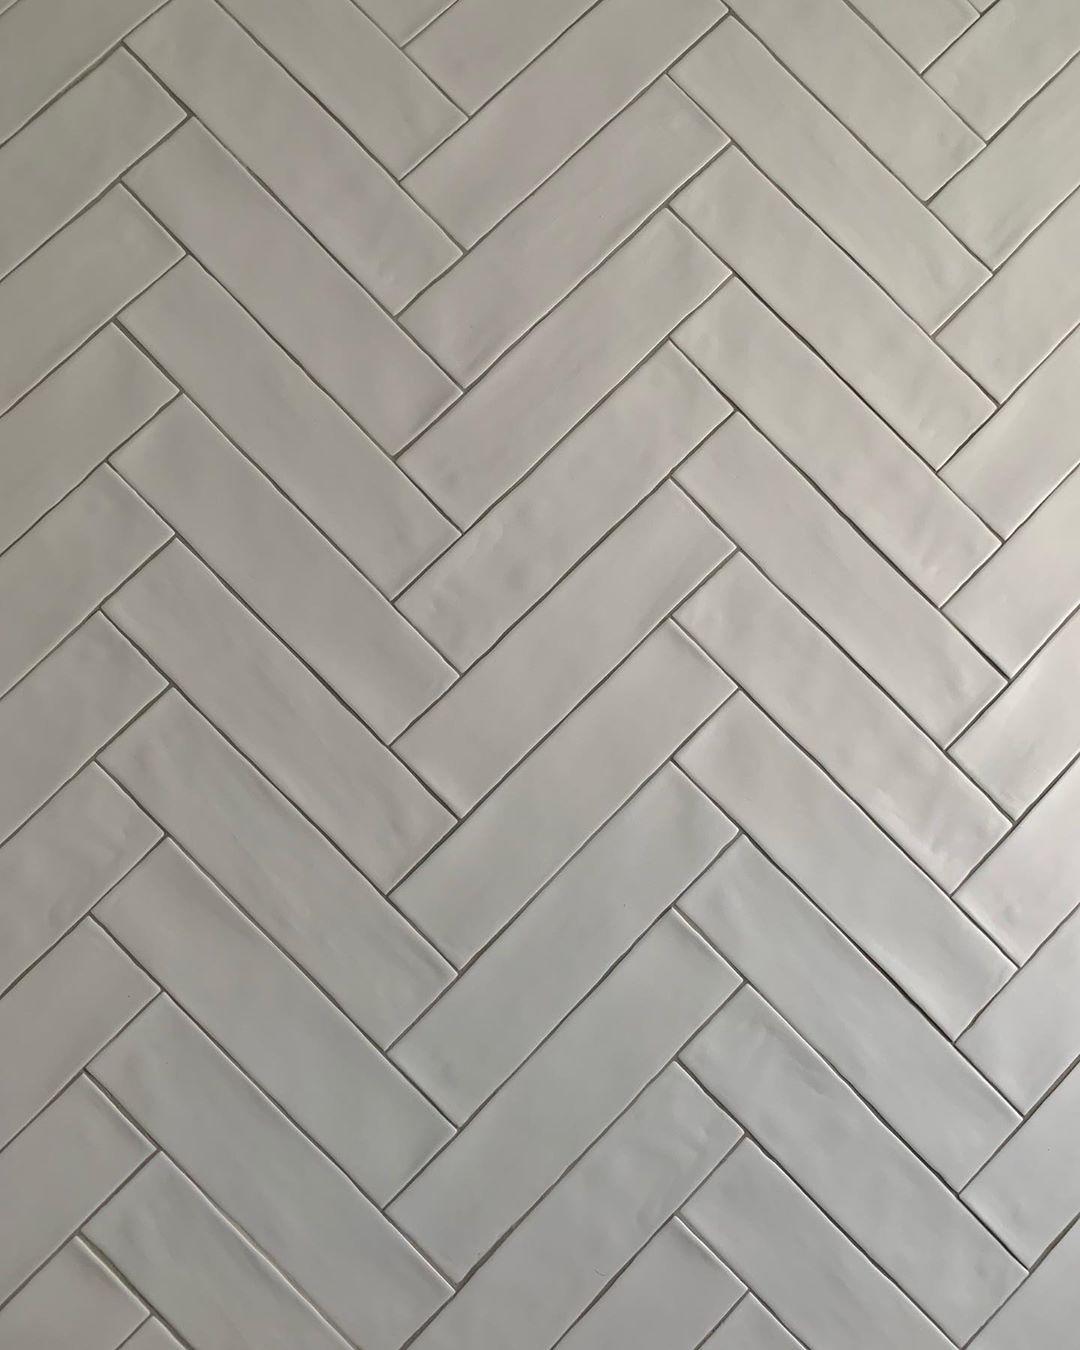 Tilecloud On Instagram Texture Texture Texture Herringbone Is The Perfect Way Herringbone Wall Tile Textured Tile Backsplash White Subway Tile Backsplash